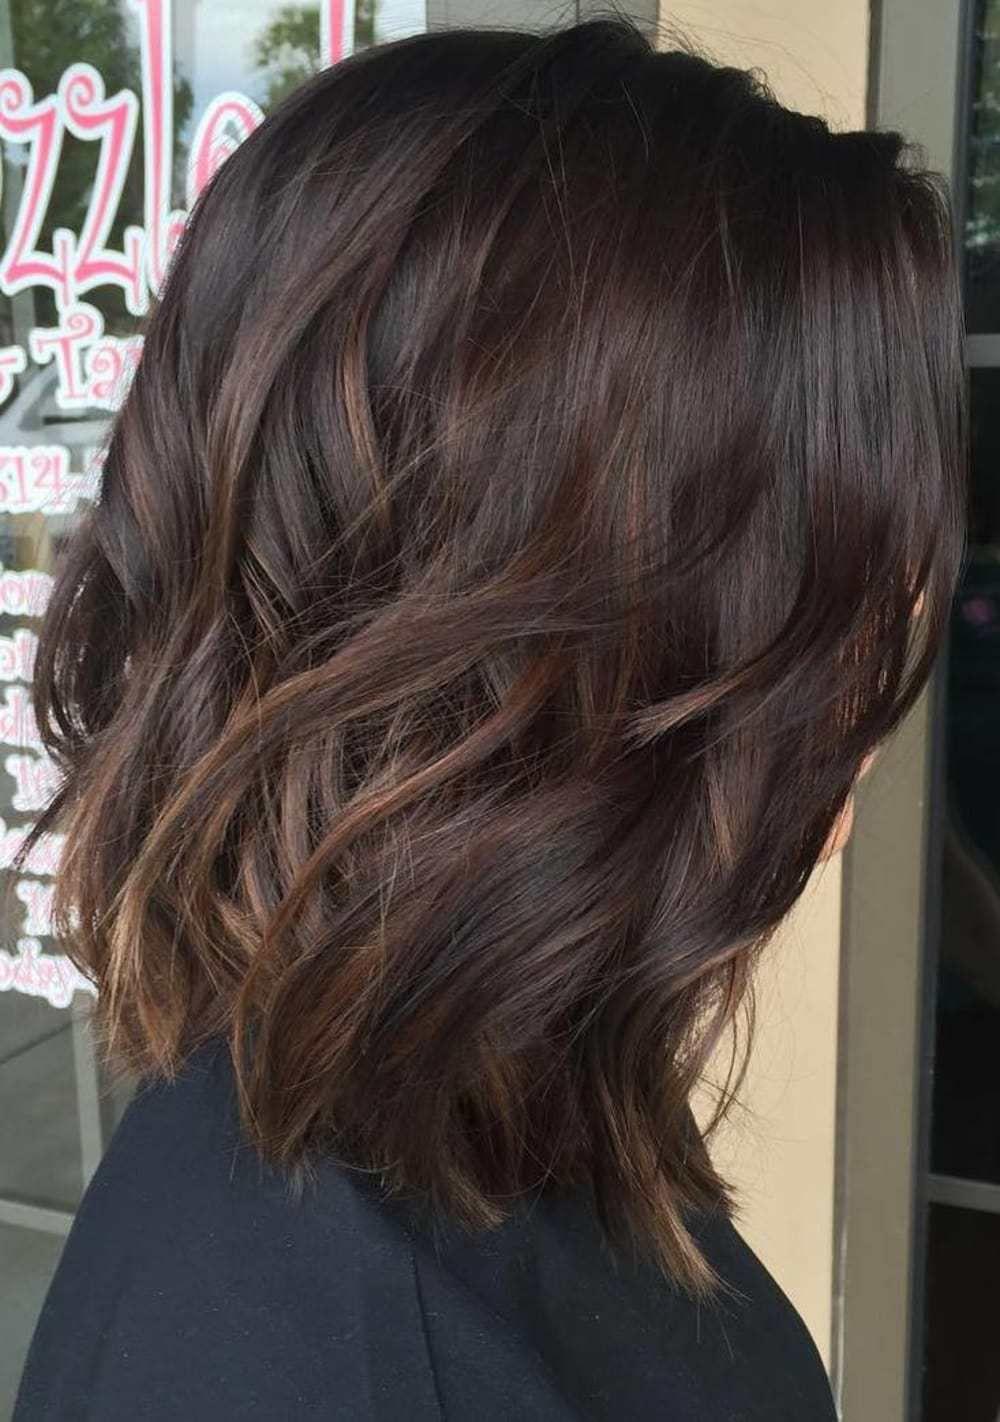 The best balayage hair color ideas flattering styles medium